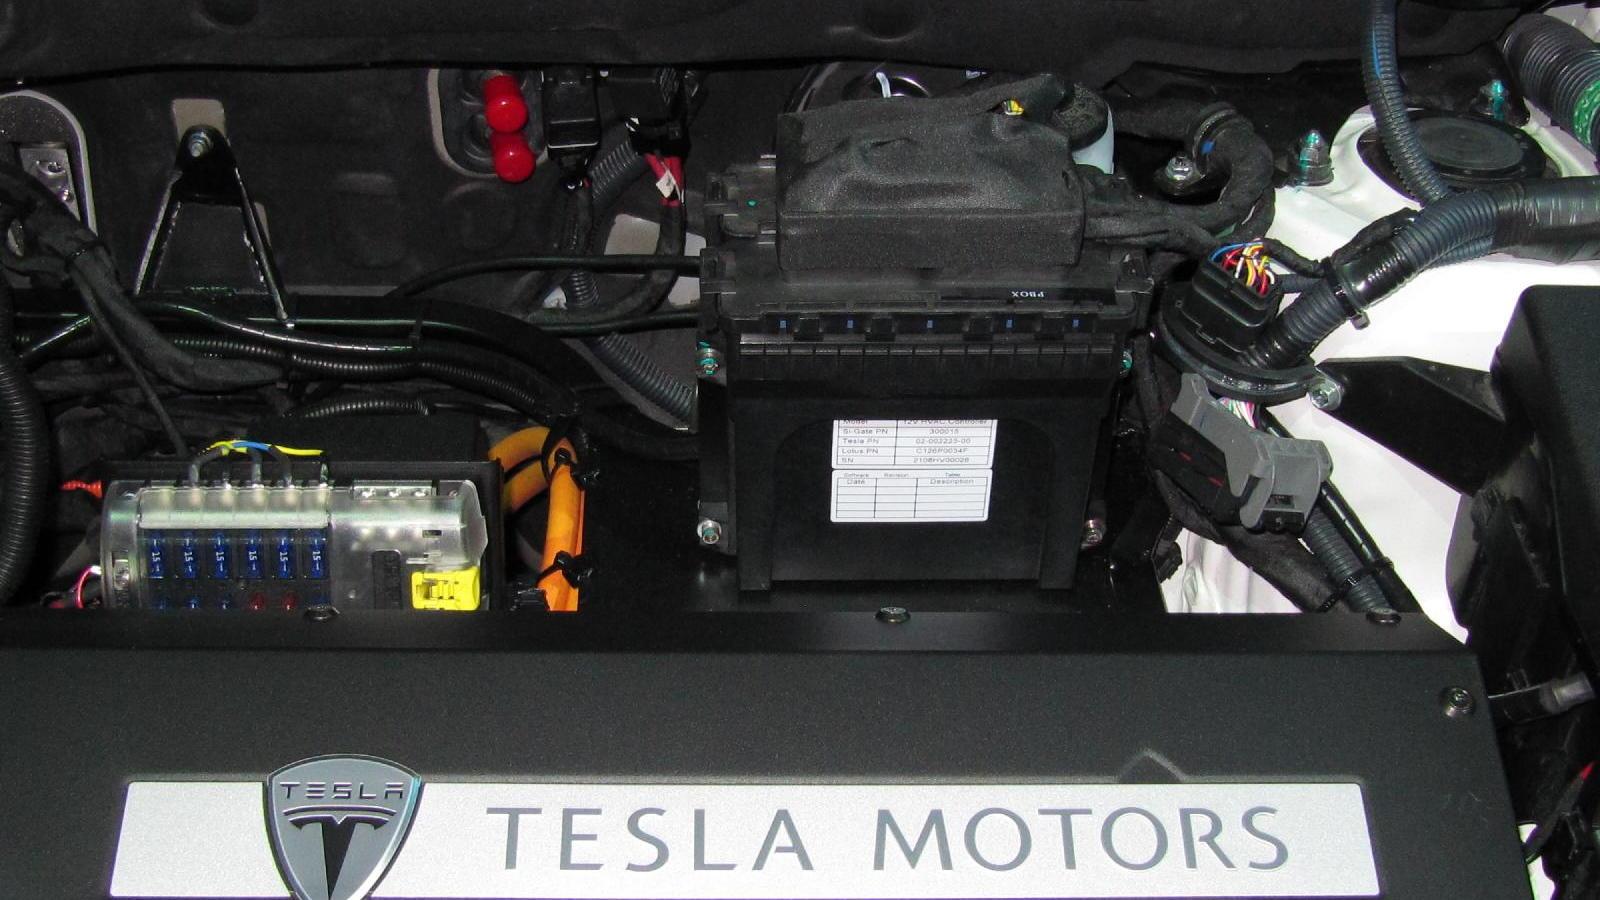 2012 Toyota RAV4 EV powered by Tesla, at 2010 Los Angeles Auto Show